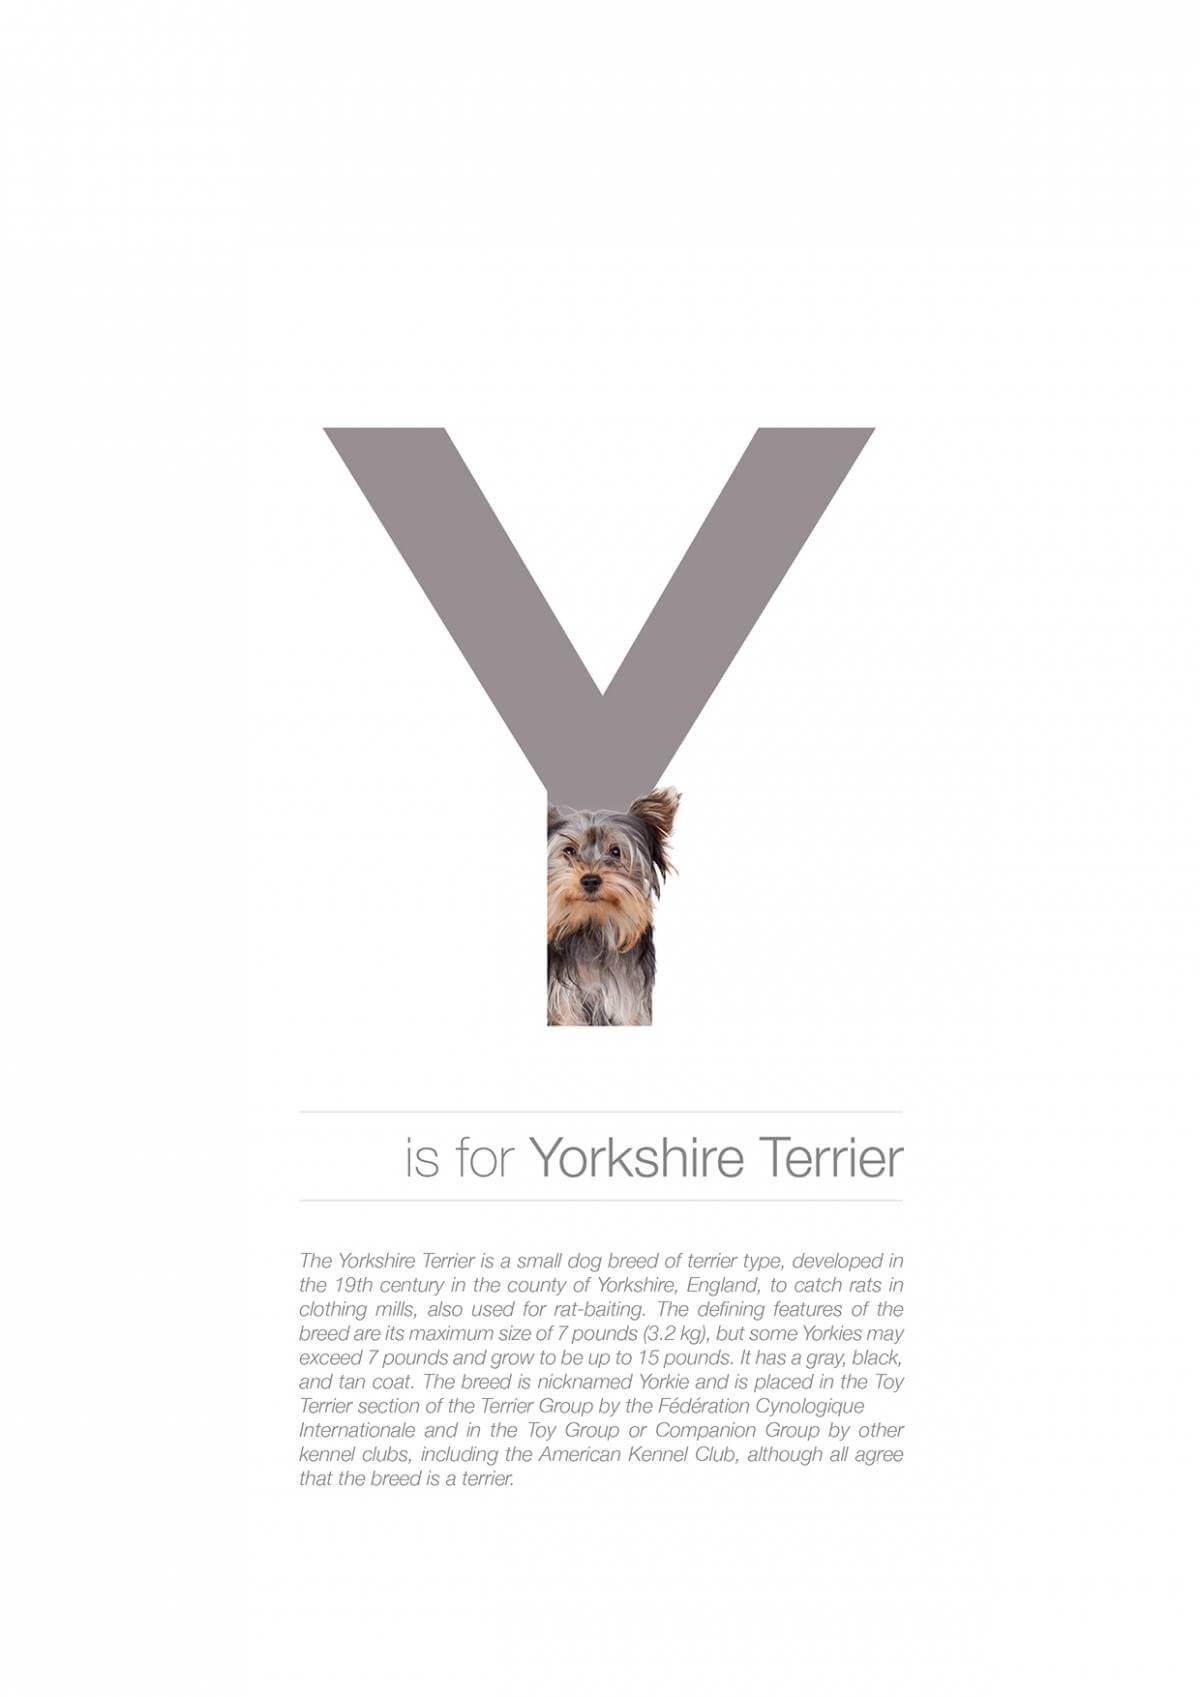 Y ตัวอักษรกราฟฟิค A Z สายพันธุ์หมาไอเดียน่ารักจากดีไซน์เนอร์โรมาเนีย